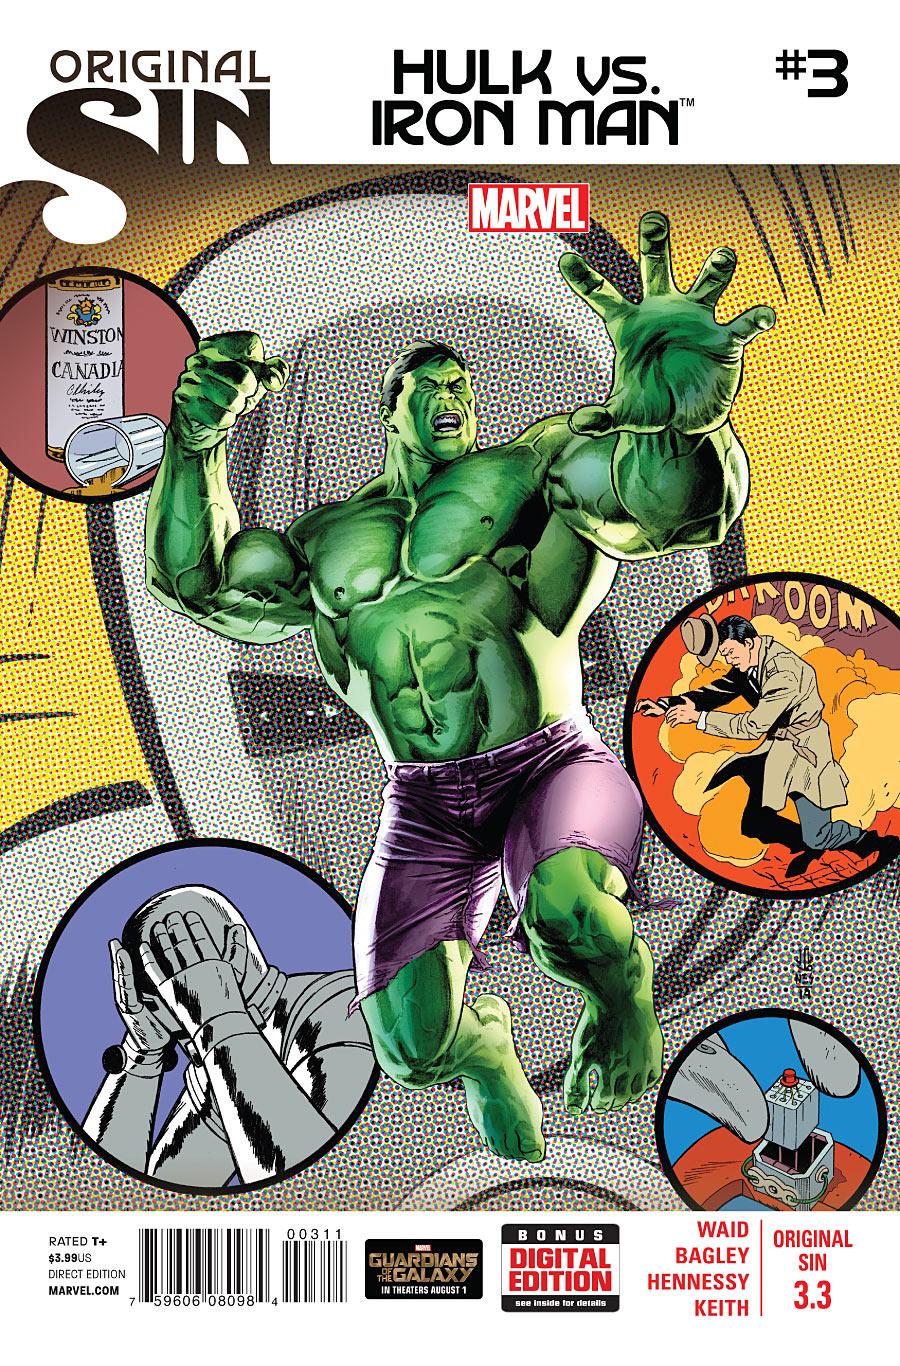 Original Sin 3.3 - Hulk Vs. Iron Man #3